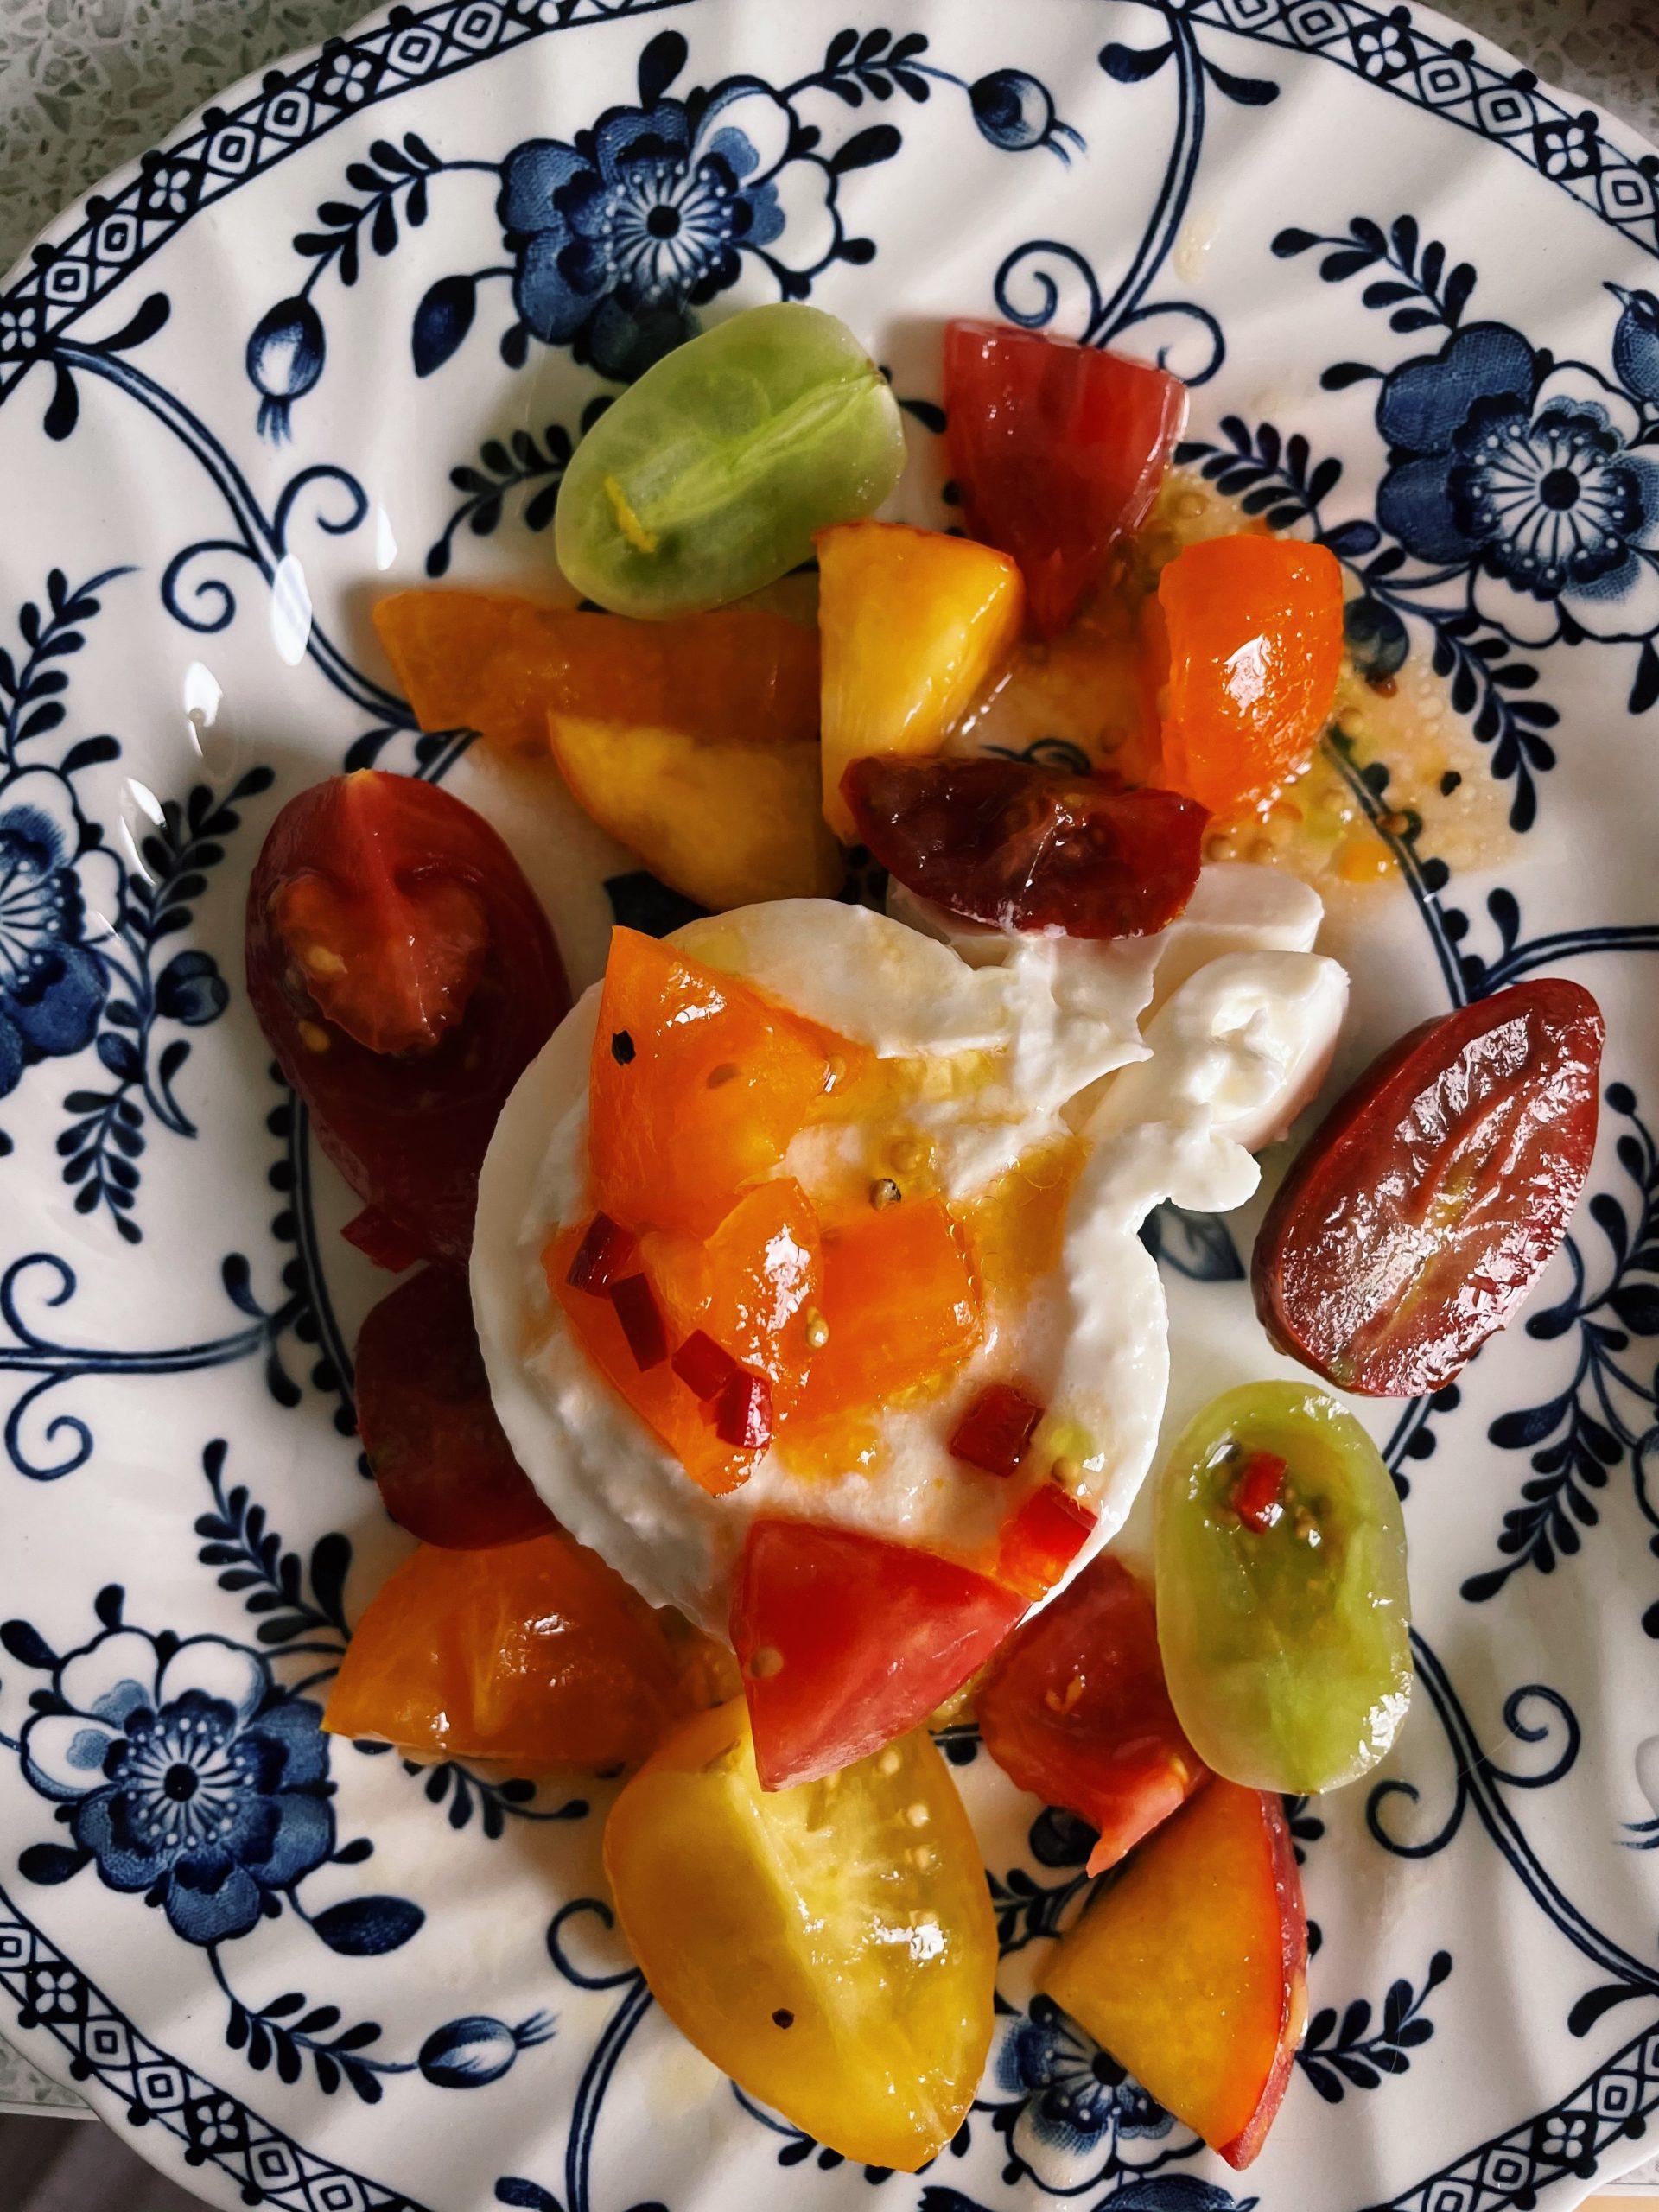 Tomato, burrata and peach salad